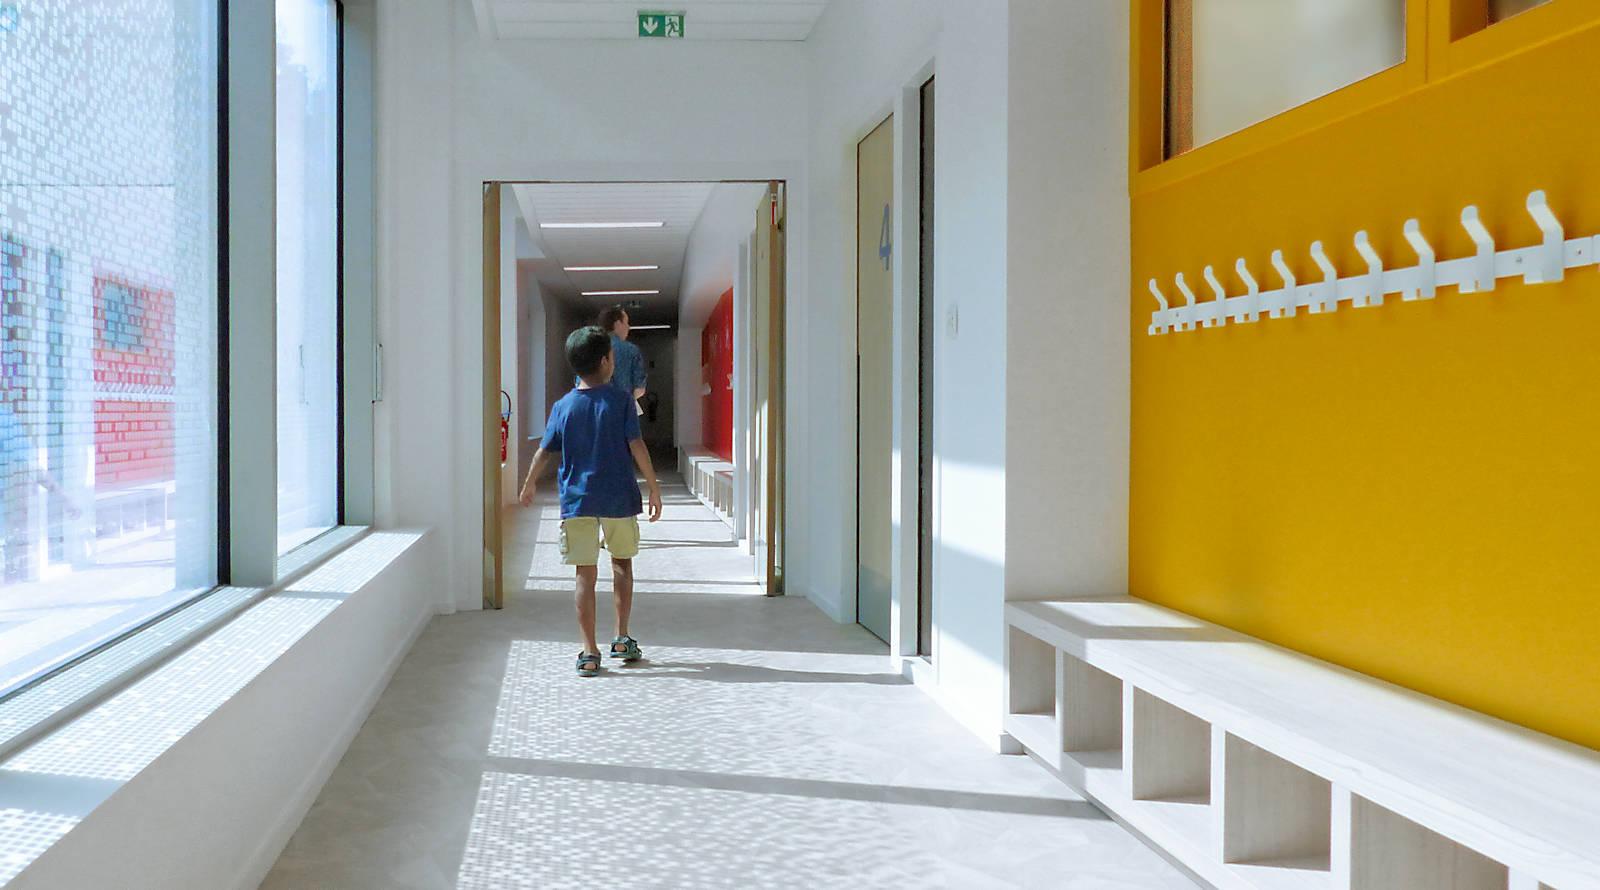 École primaire Charles de Gaulle, Tourcoing - Couloir